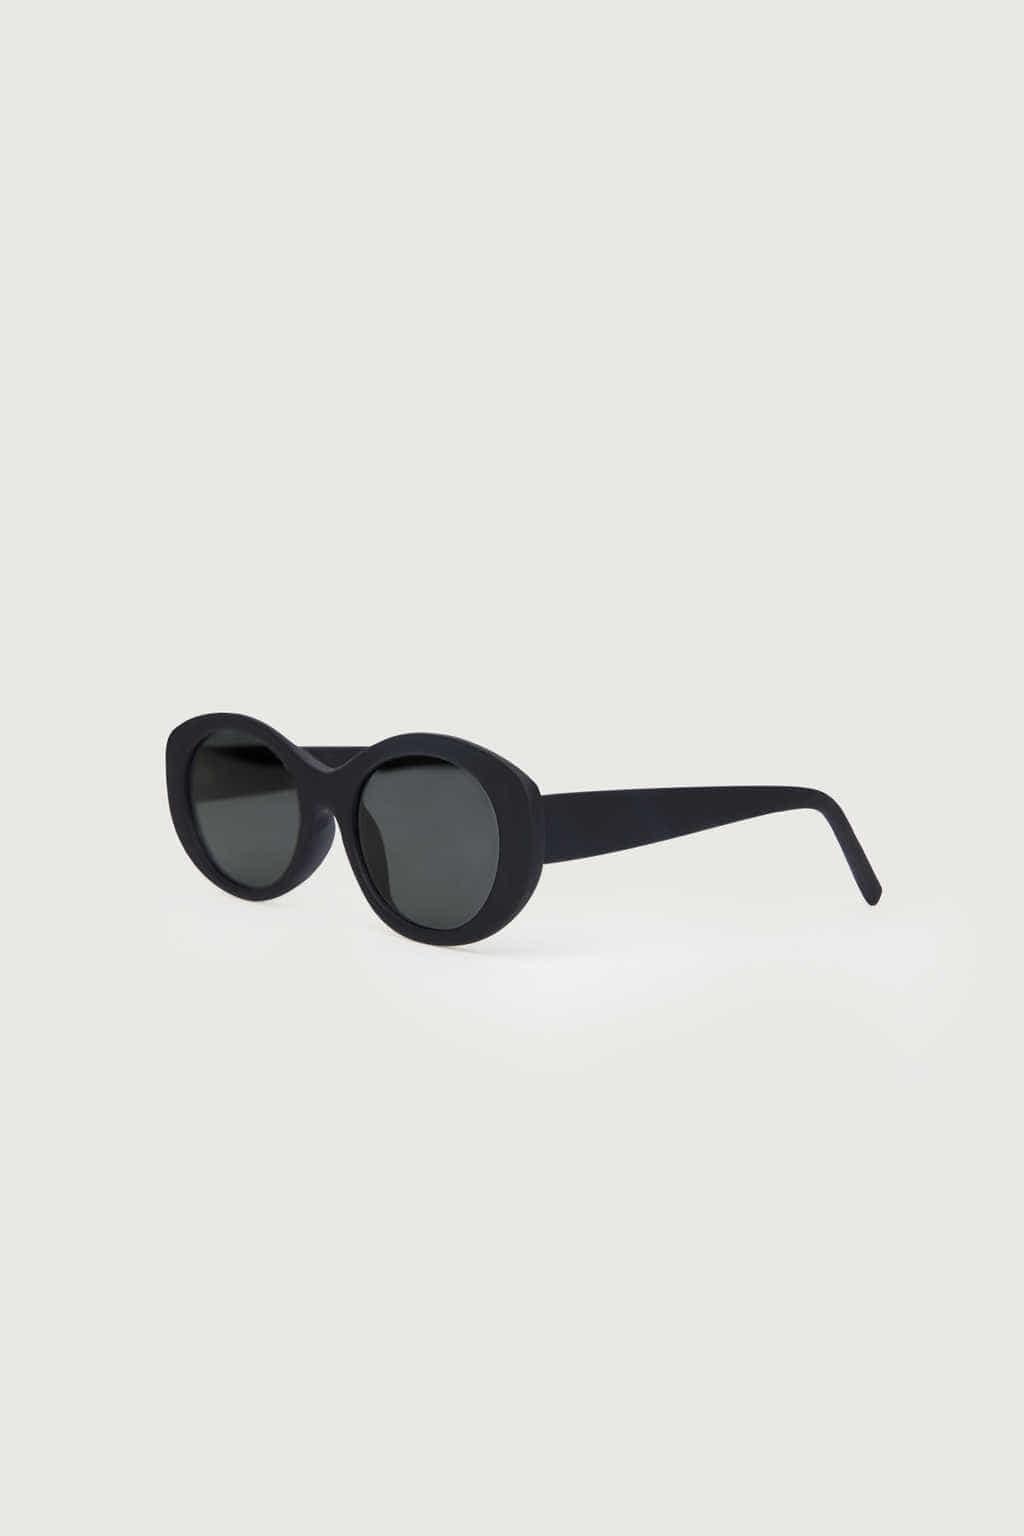 Sunglass 3367 Black 6